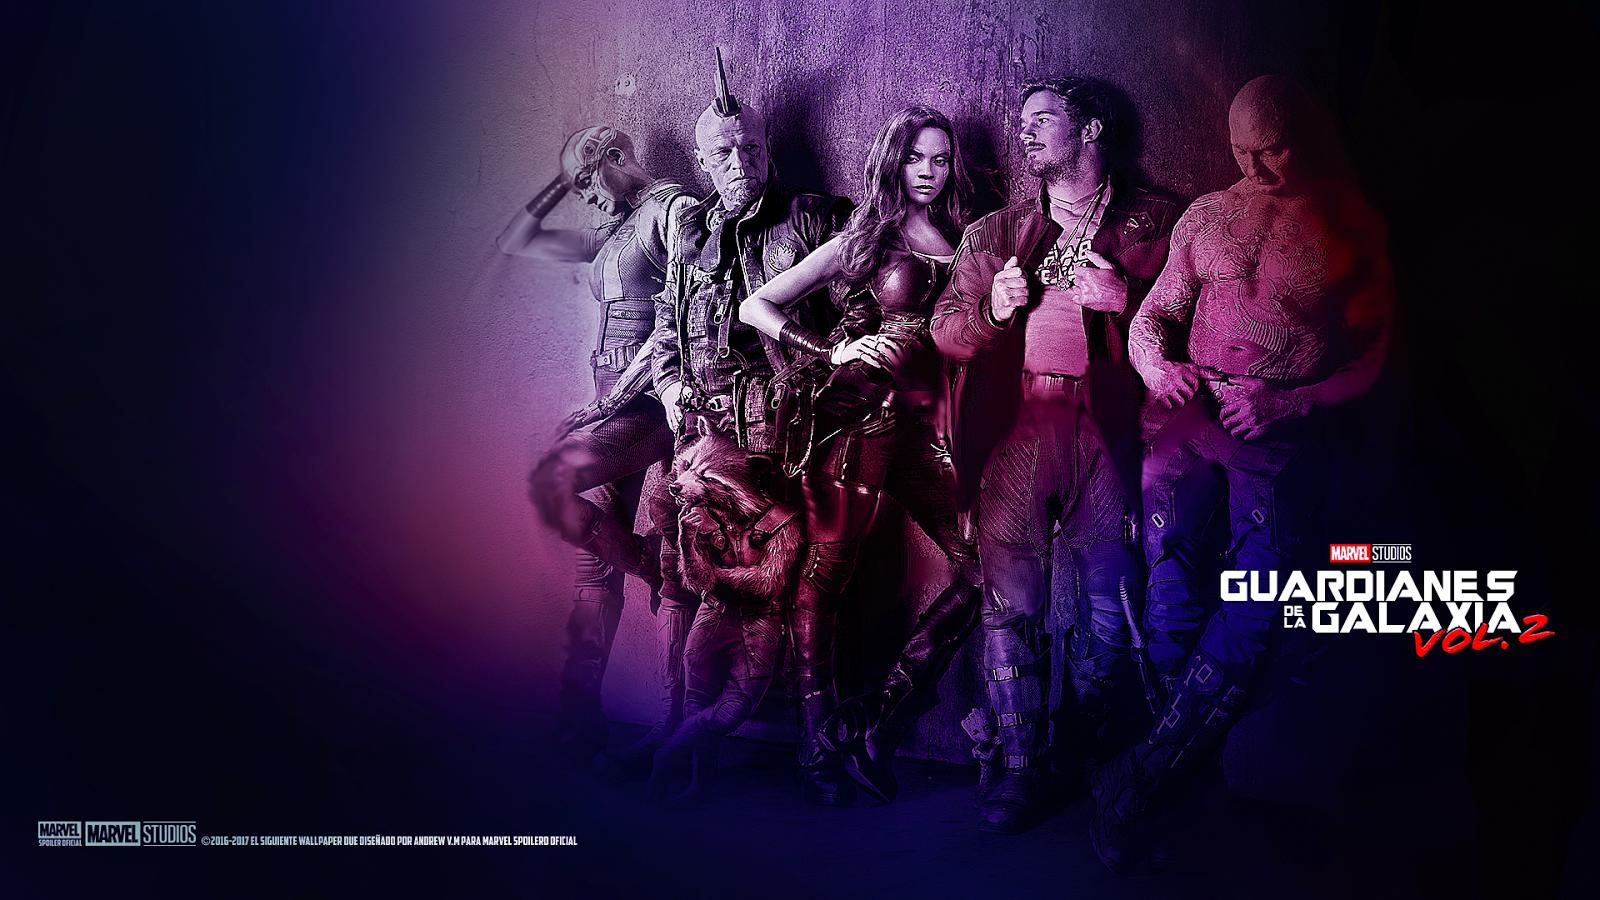 Guardians Of The Galaxy Vol 2 Wallpaper: 1600x900px Guardians Of The Galaxy Vol. 2 Wallpapers